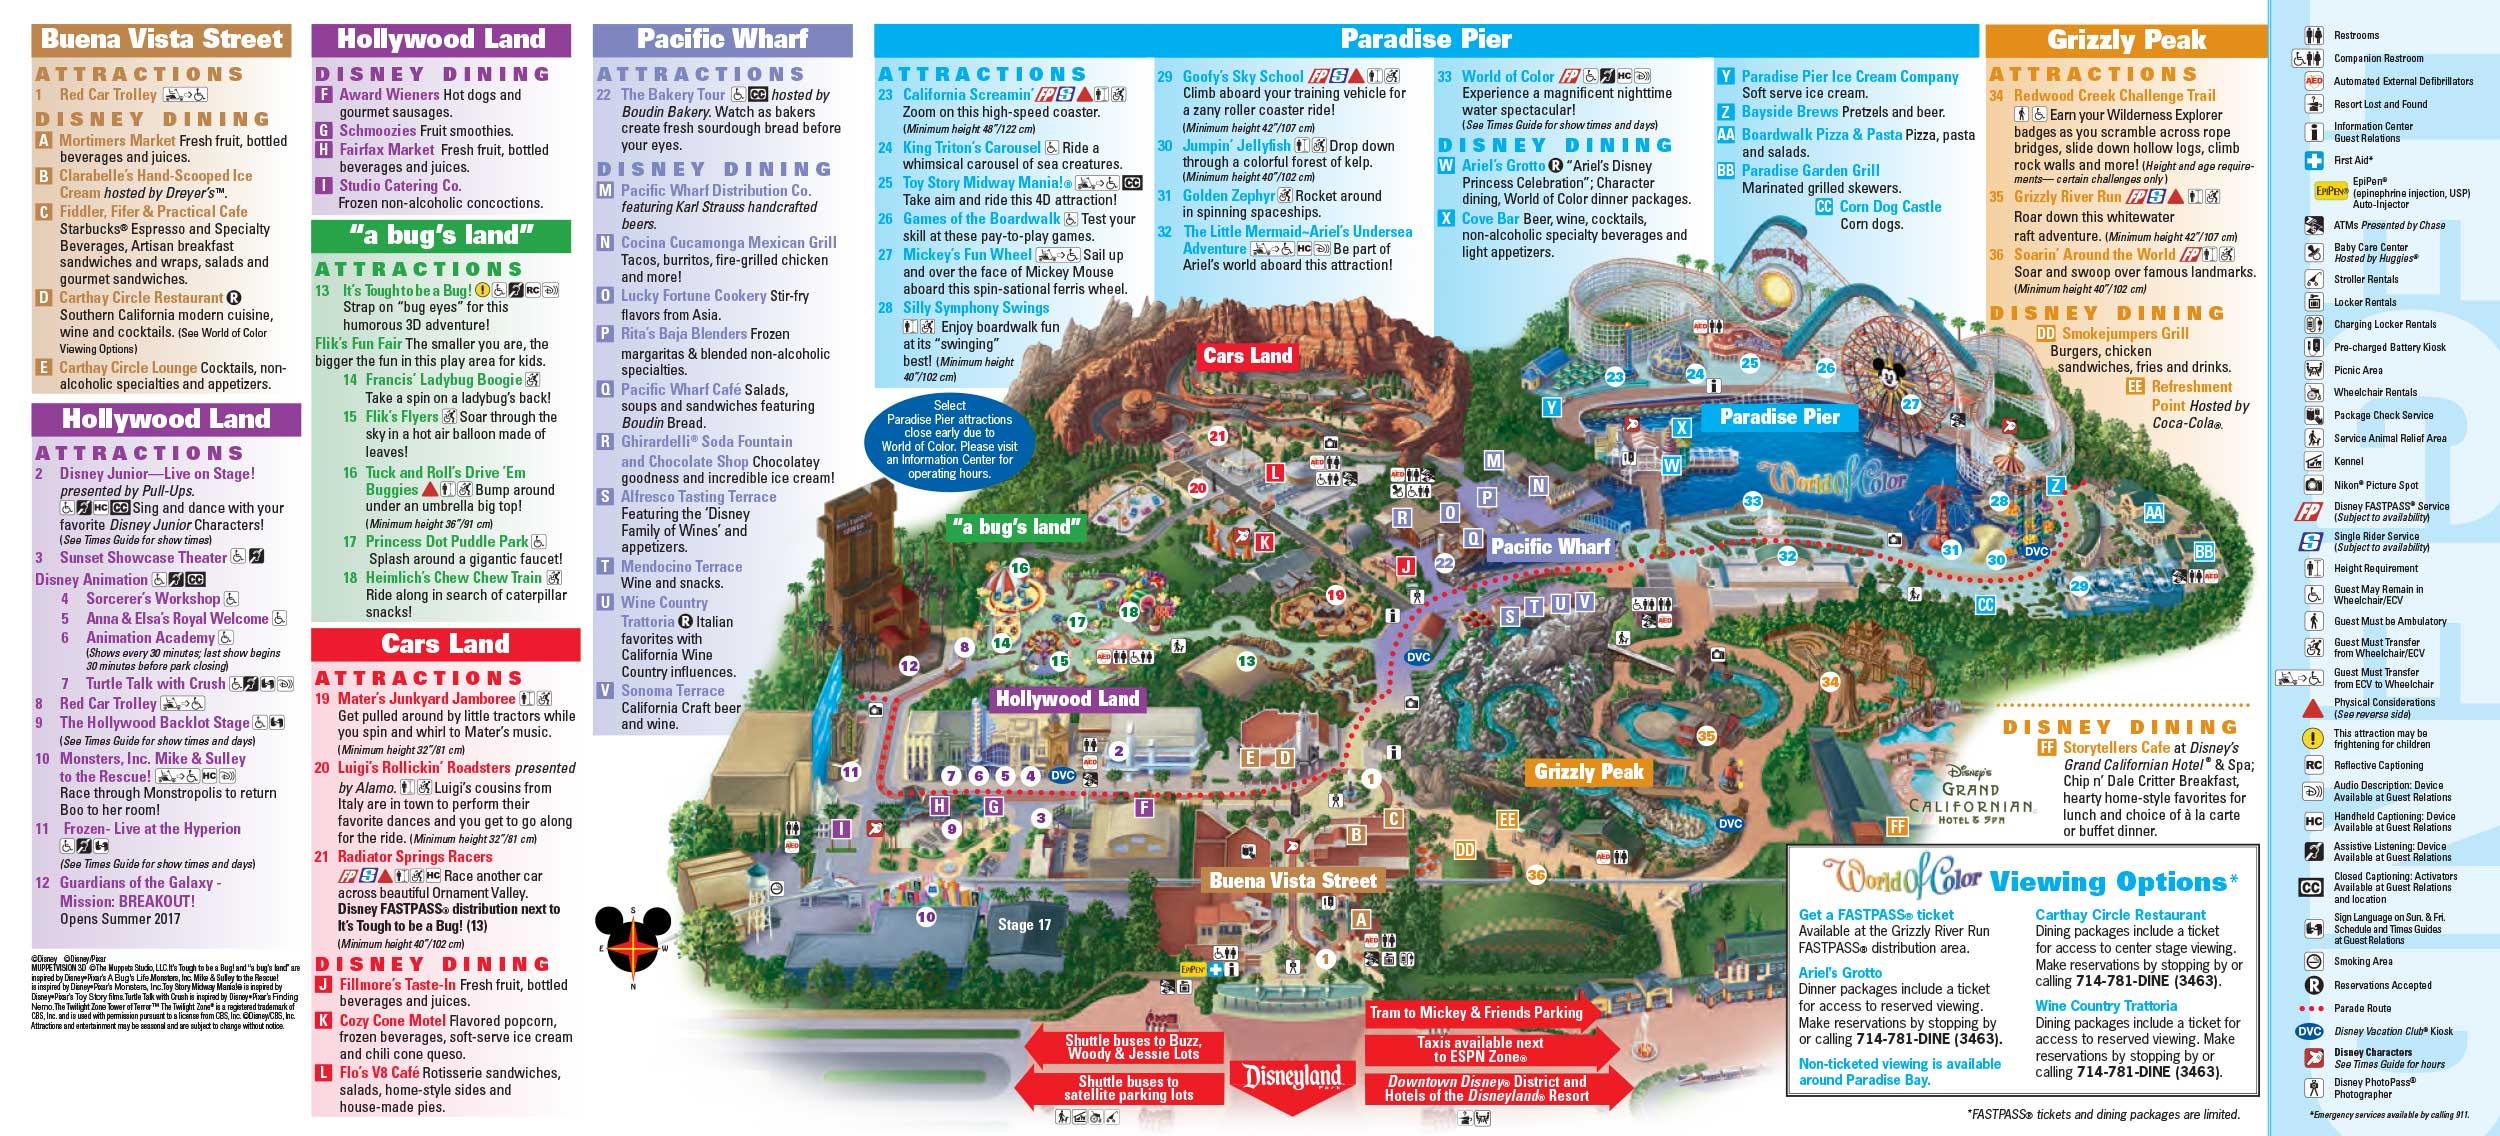 Disney California Adventure Map Blank Maps Of California Amusement - Map Of California Parks